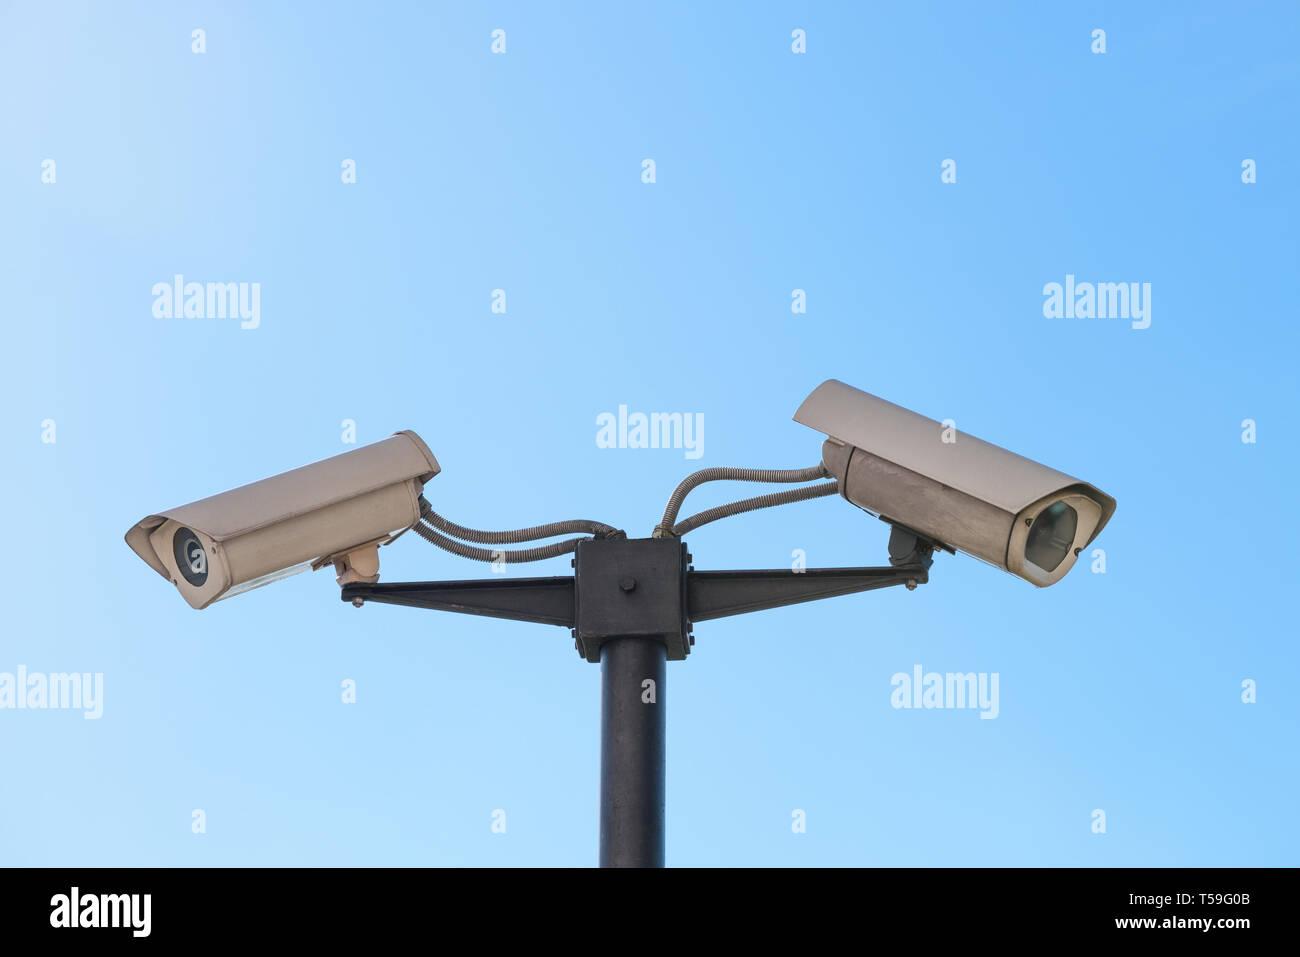 CCTV surveillance cameras on pillar mount over blue sky background - Stock Image